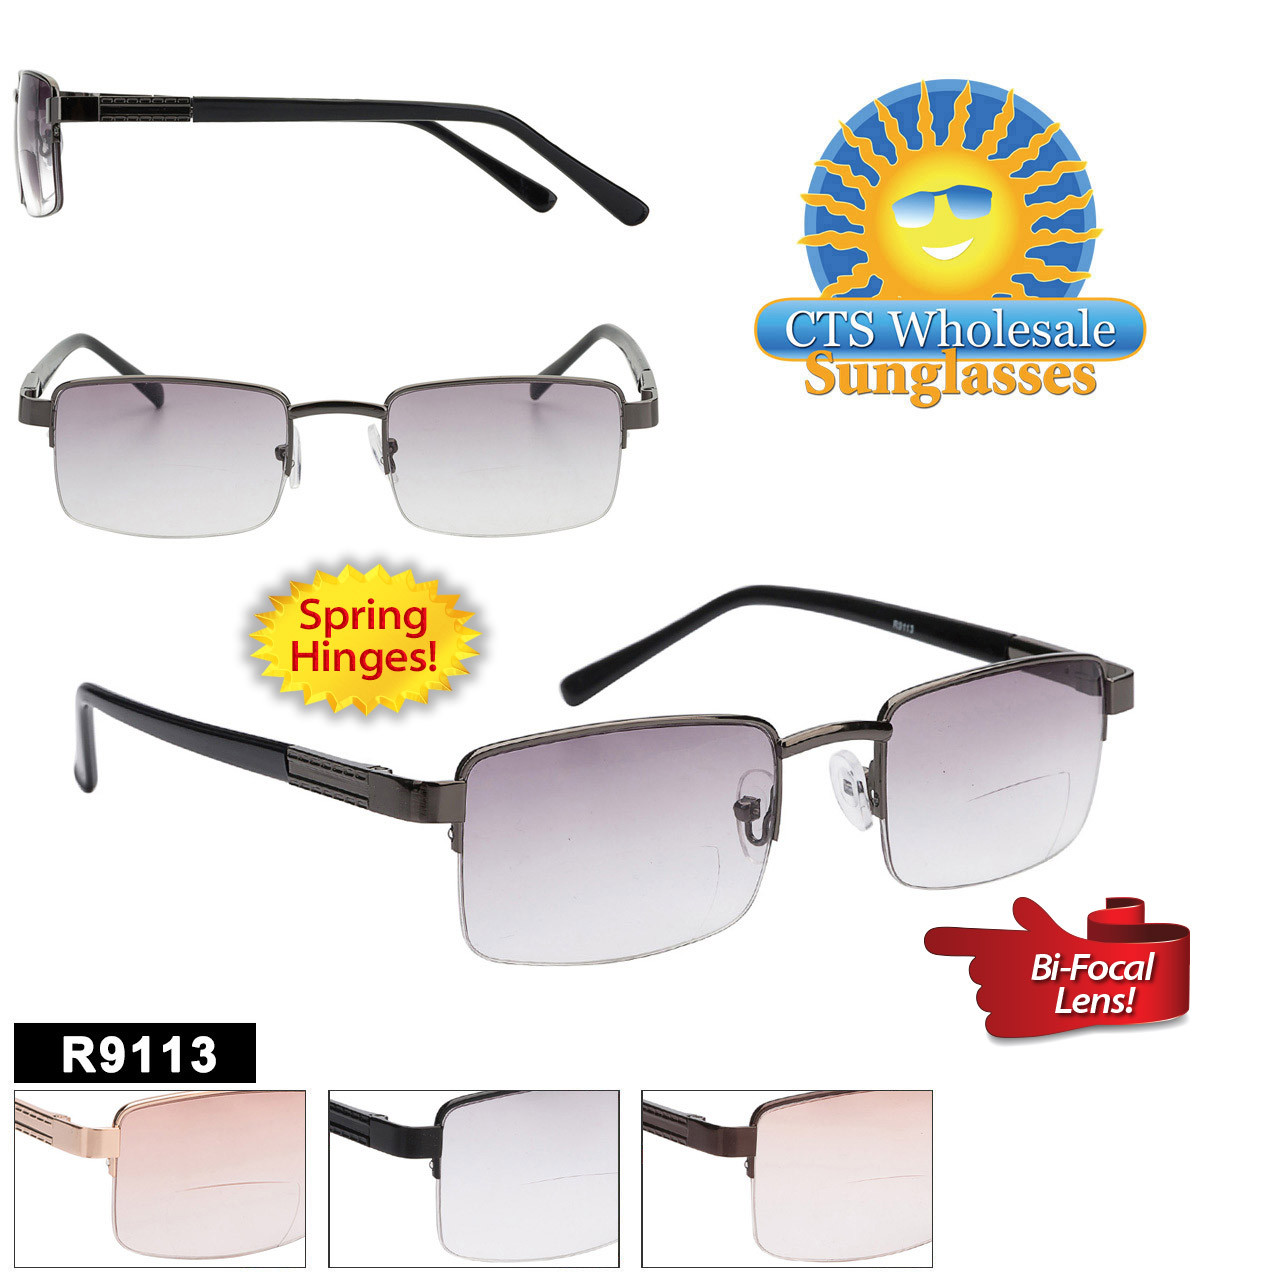 Tinted Bi-Focal Reading Glasses - R9113 Spring Hinges!